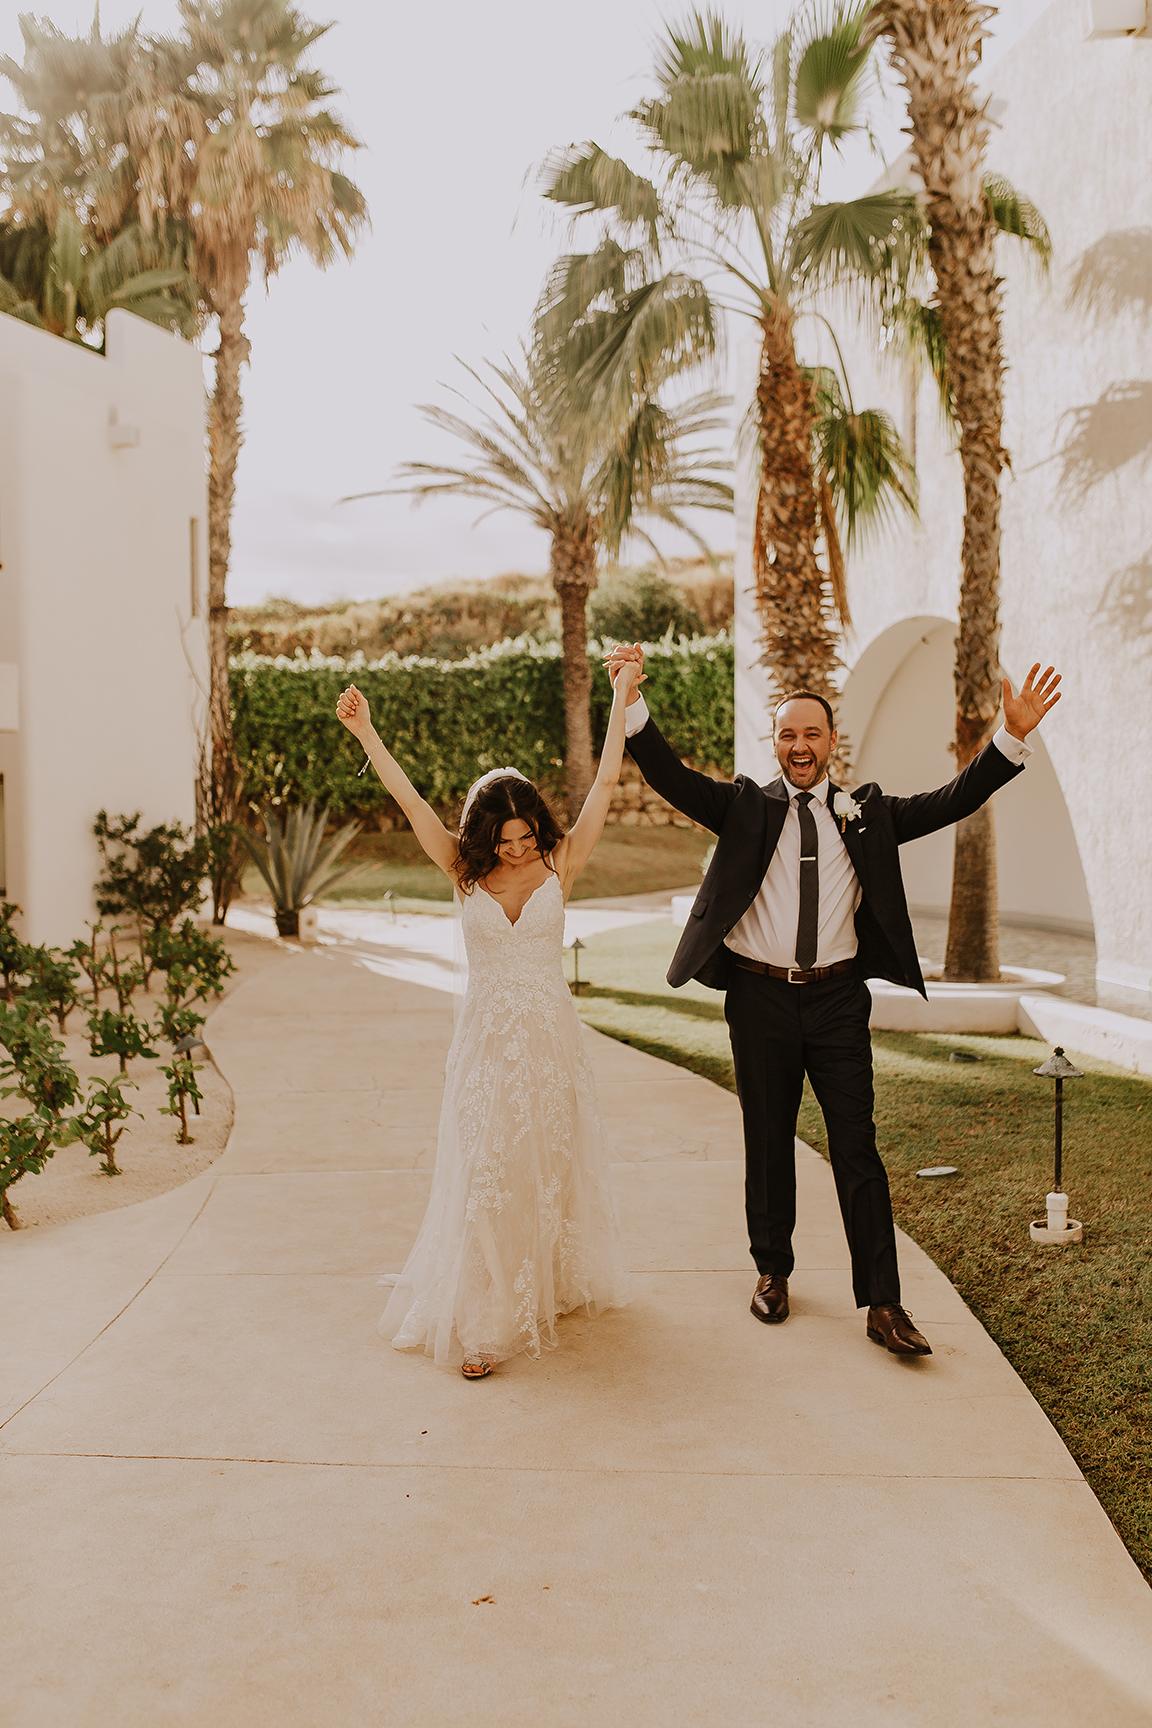 Lindsei+James_cabo_wedding_453.jpg